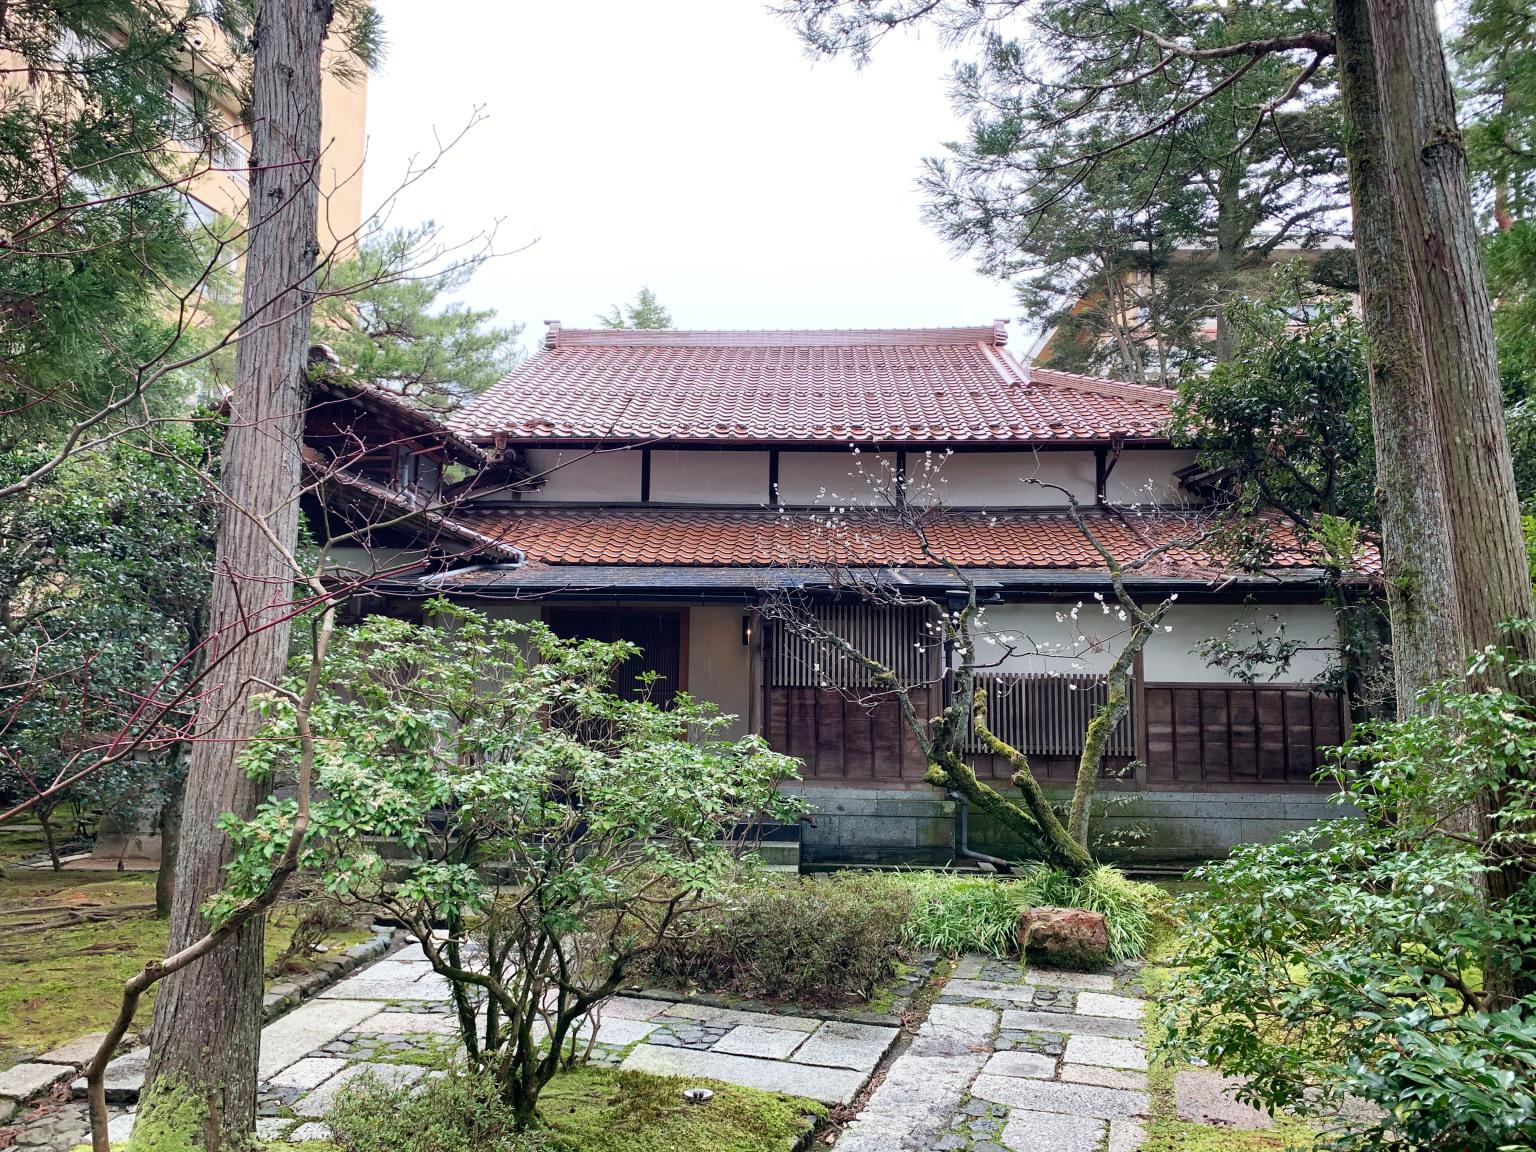 Houshi-Ryokan-onsen-hotel-oldest-in-world-Japan-business-travel-Hoshi-accommodation-stay-photos-reviews-Ishikawa-28.jpg